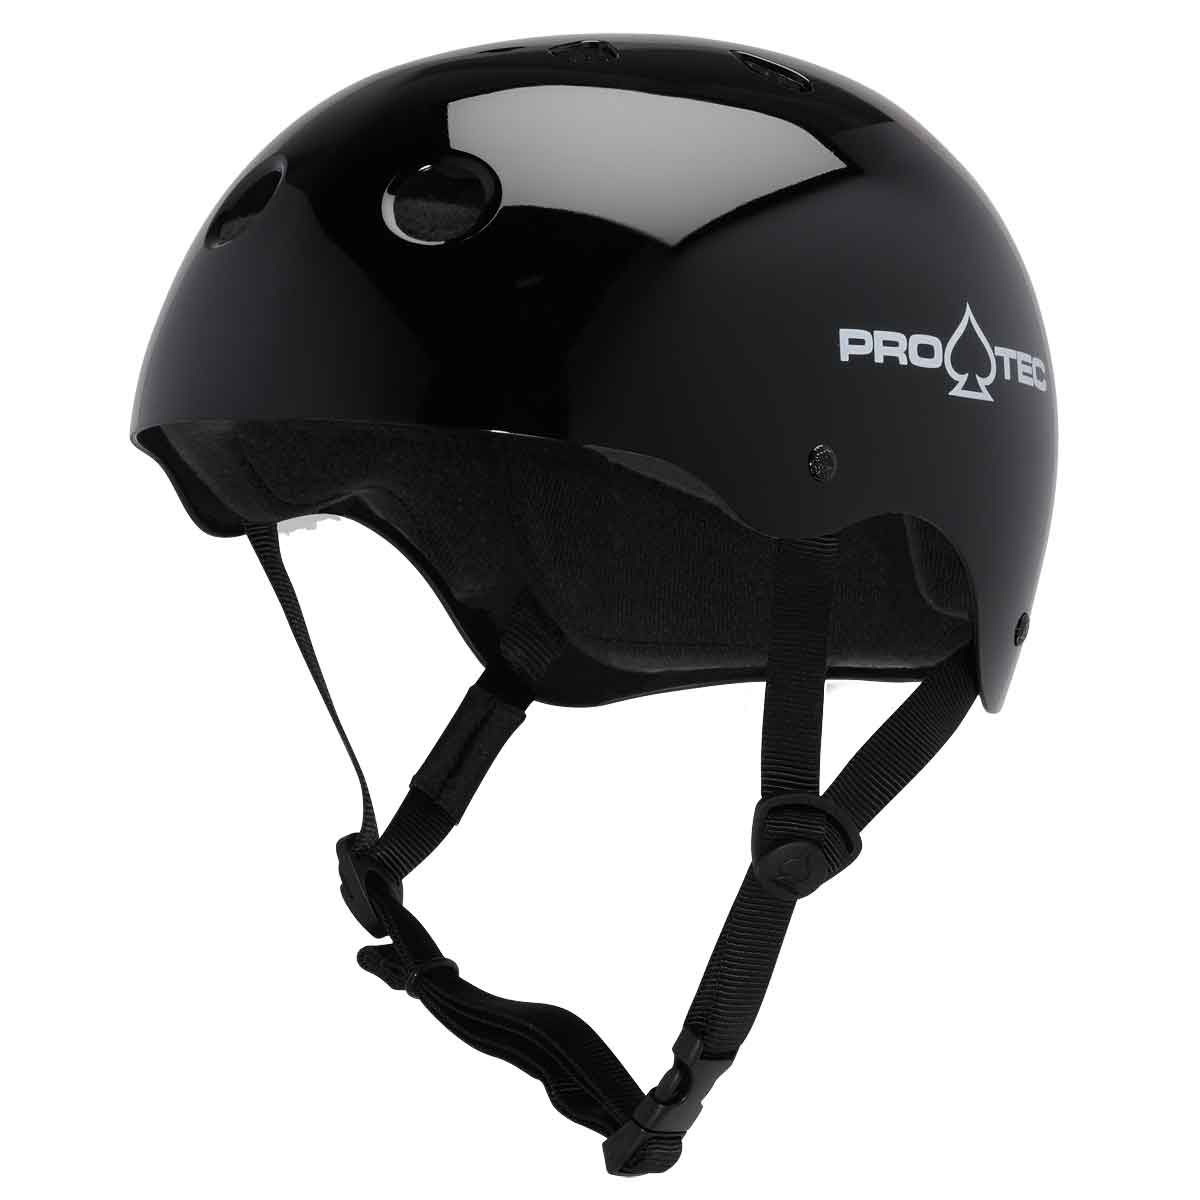 super specials reasonably priced order Pro-Tec Classic Skate Helmet - Gloss Black